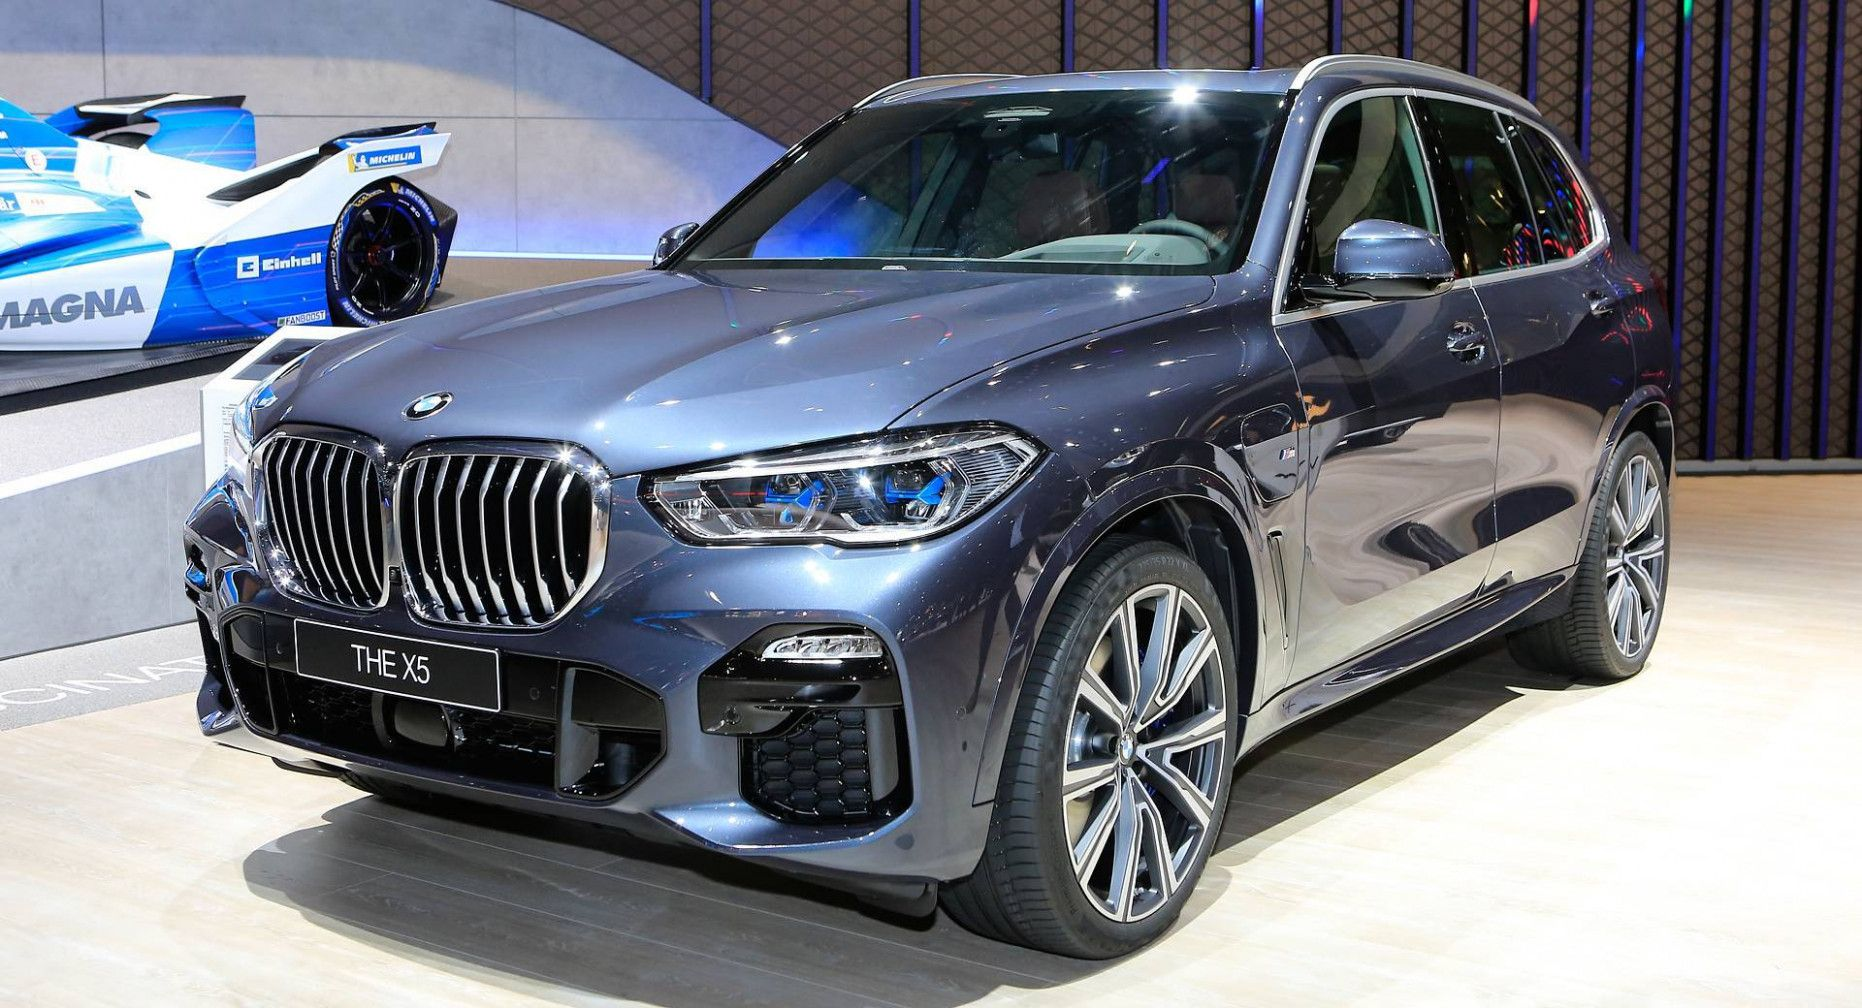 2020 Bmw X5 Edrive In 2020 Bmw Bmw X5 Hybrid Car